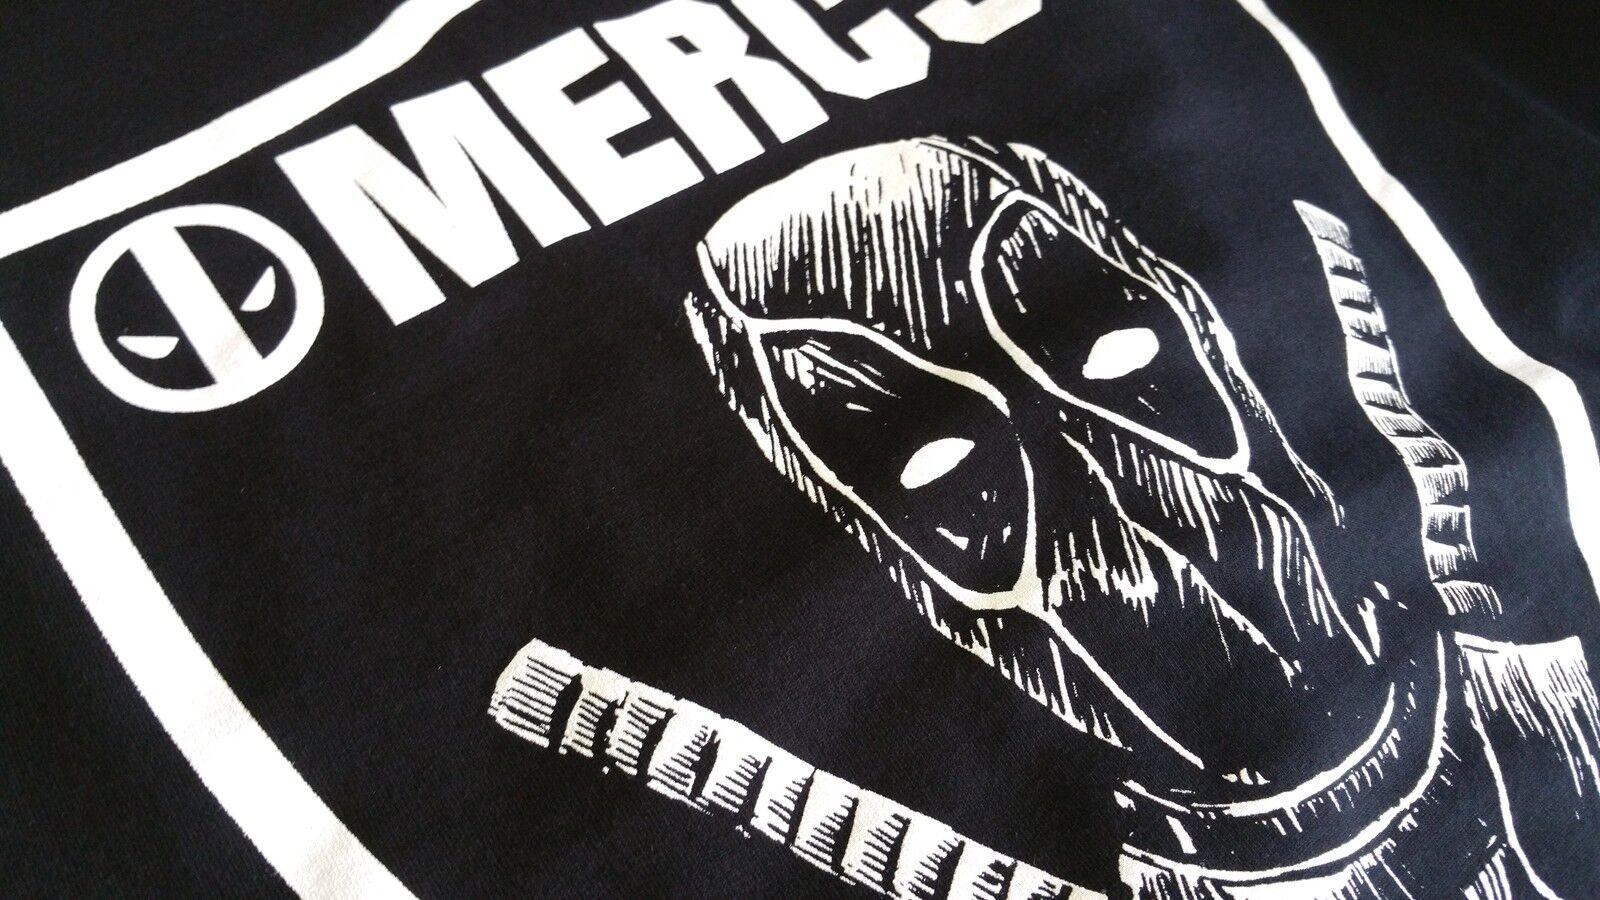 Merc Raider College Giacca Deadpool, Cimicianga, Taco, Merc, Mouth, anti, anti, anti, Hero 5bac7d